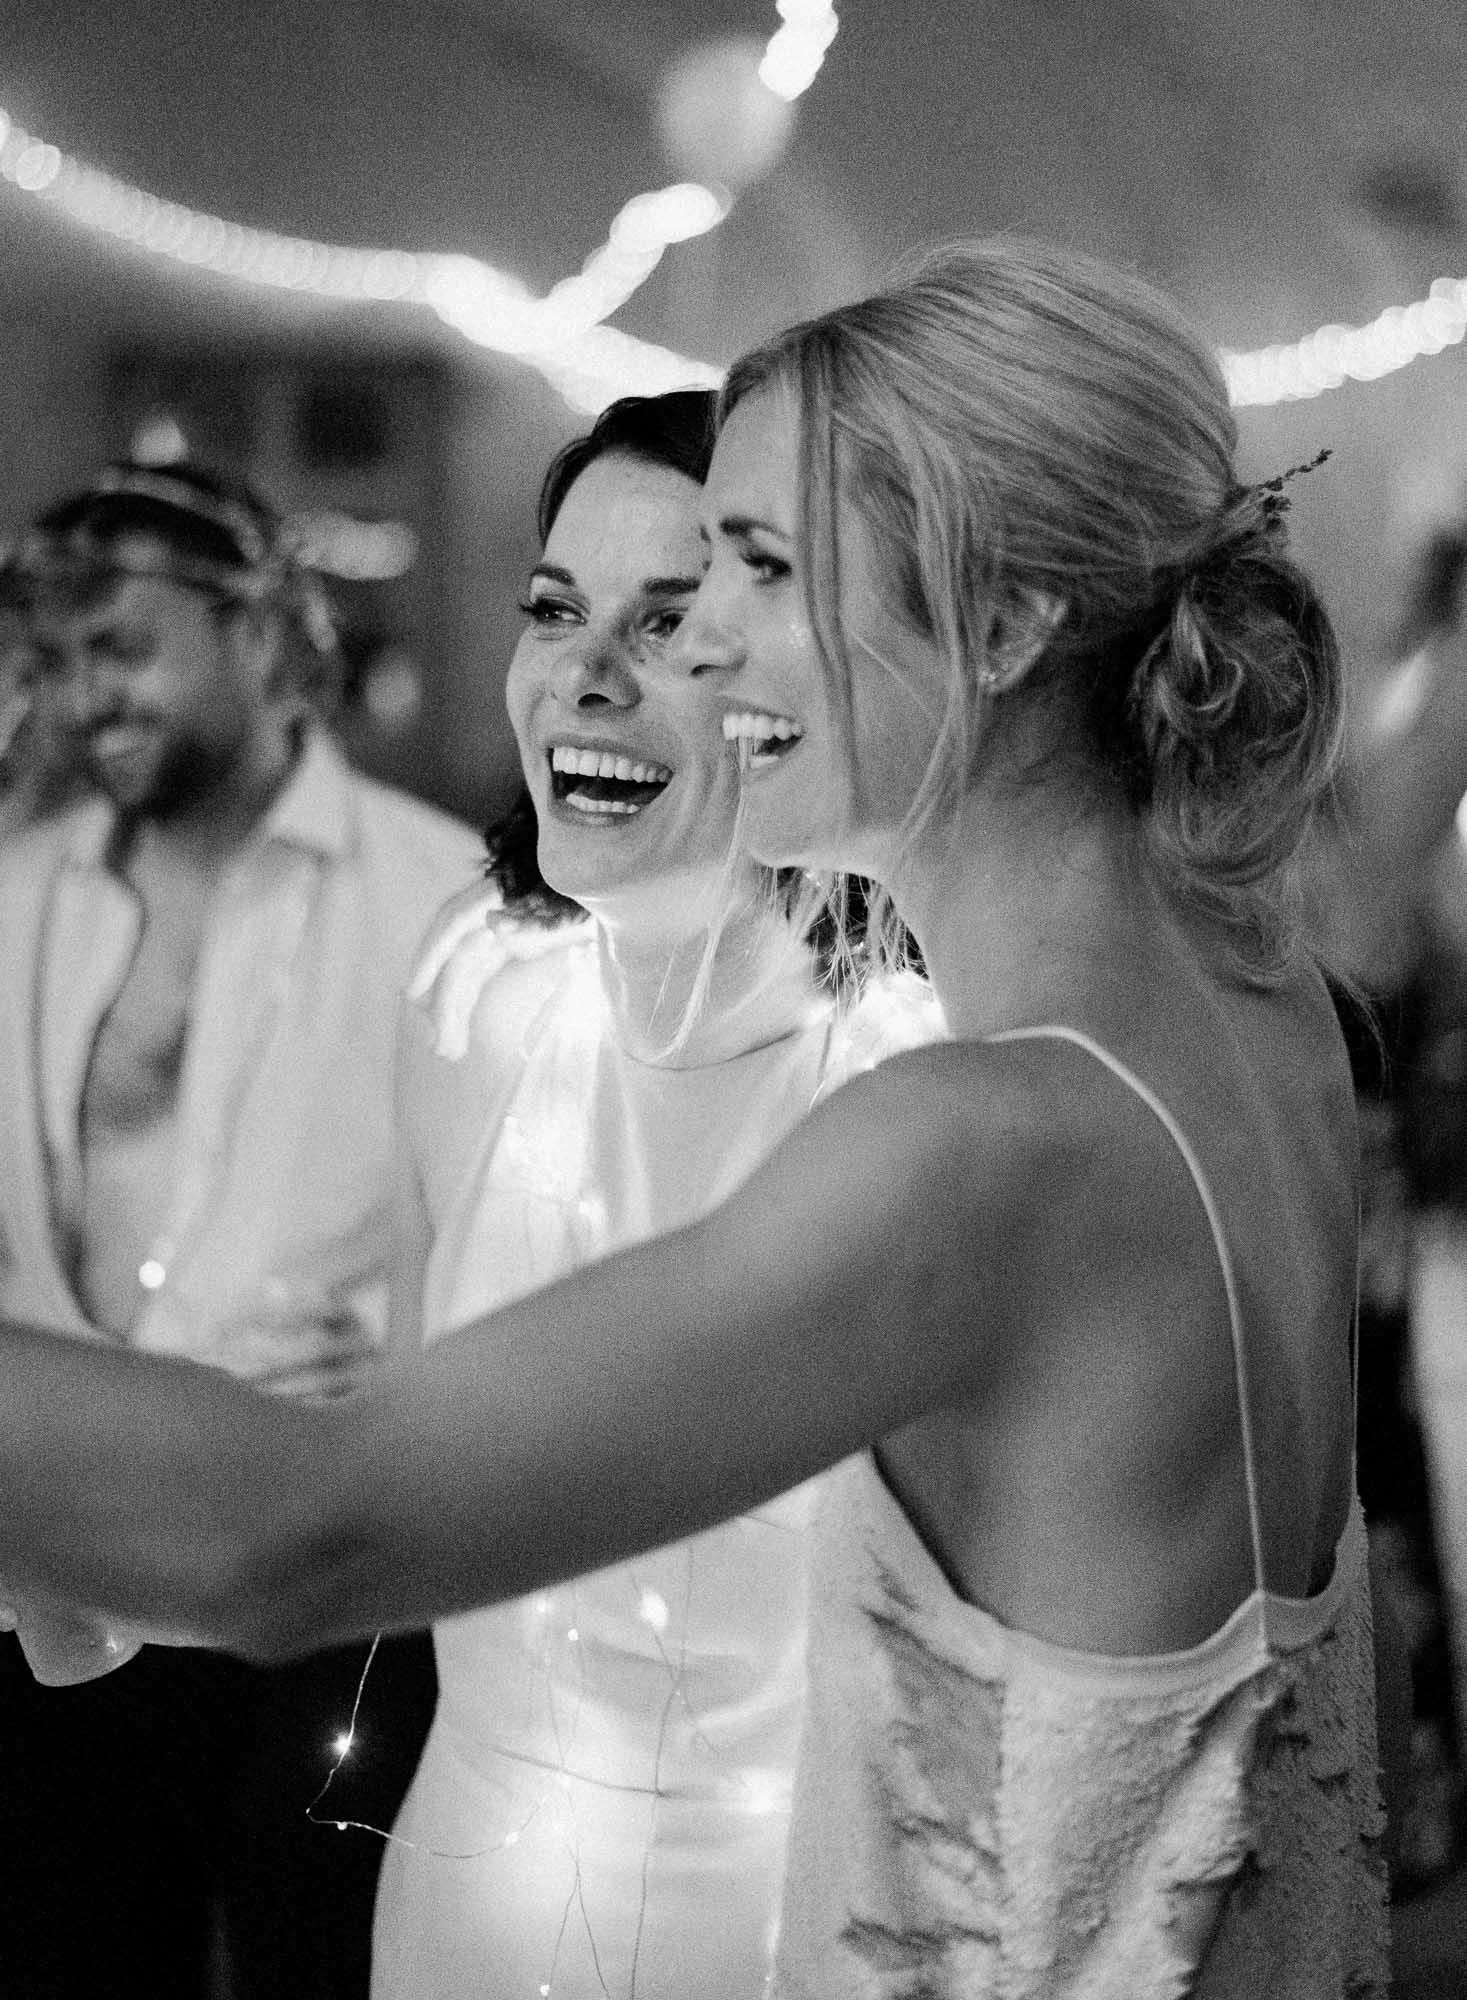 gascony_french_wedding-79.jpg